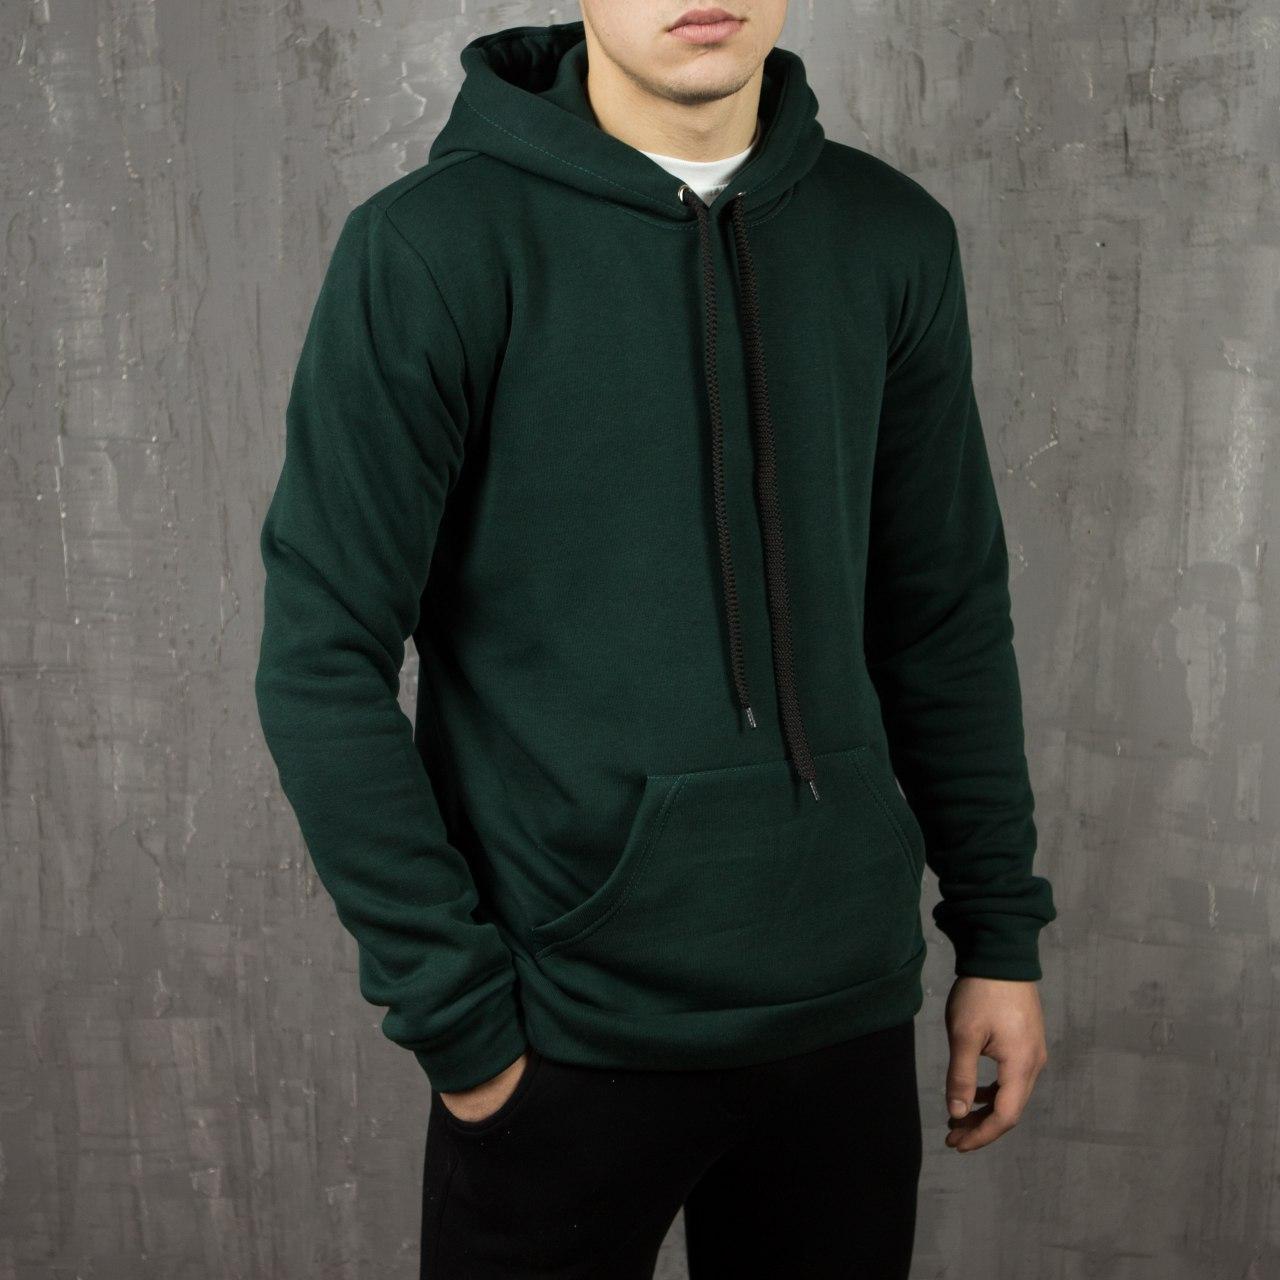 Мужское базовое худи темно-зеленое